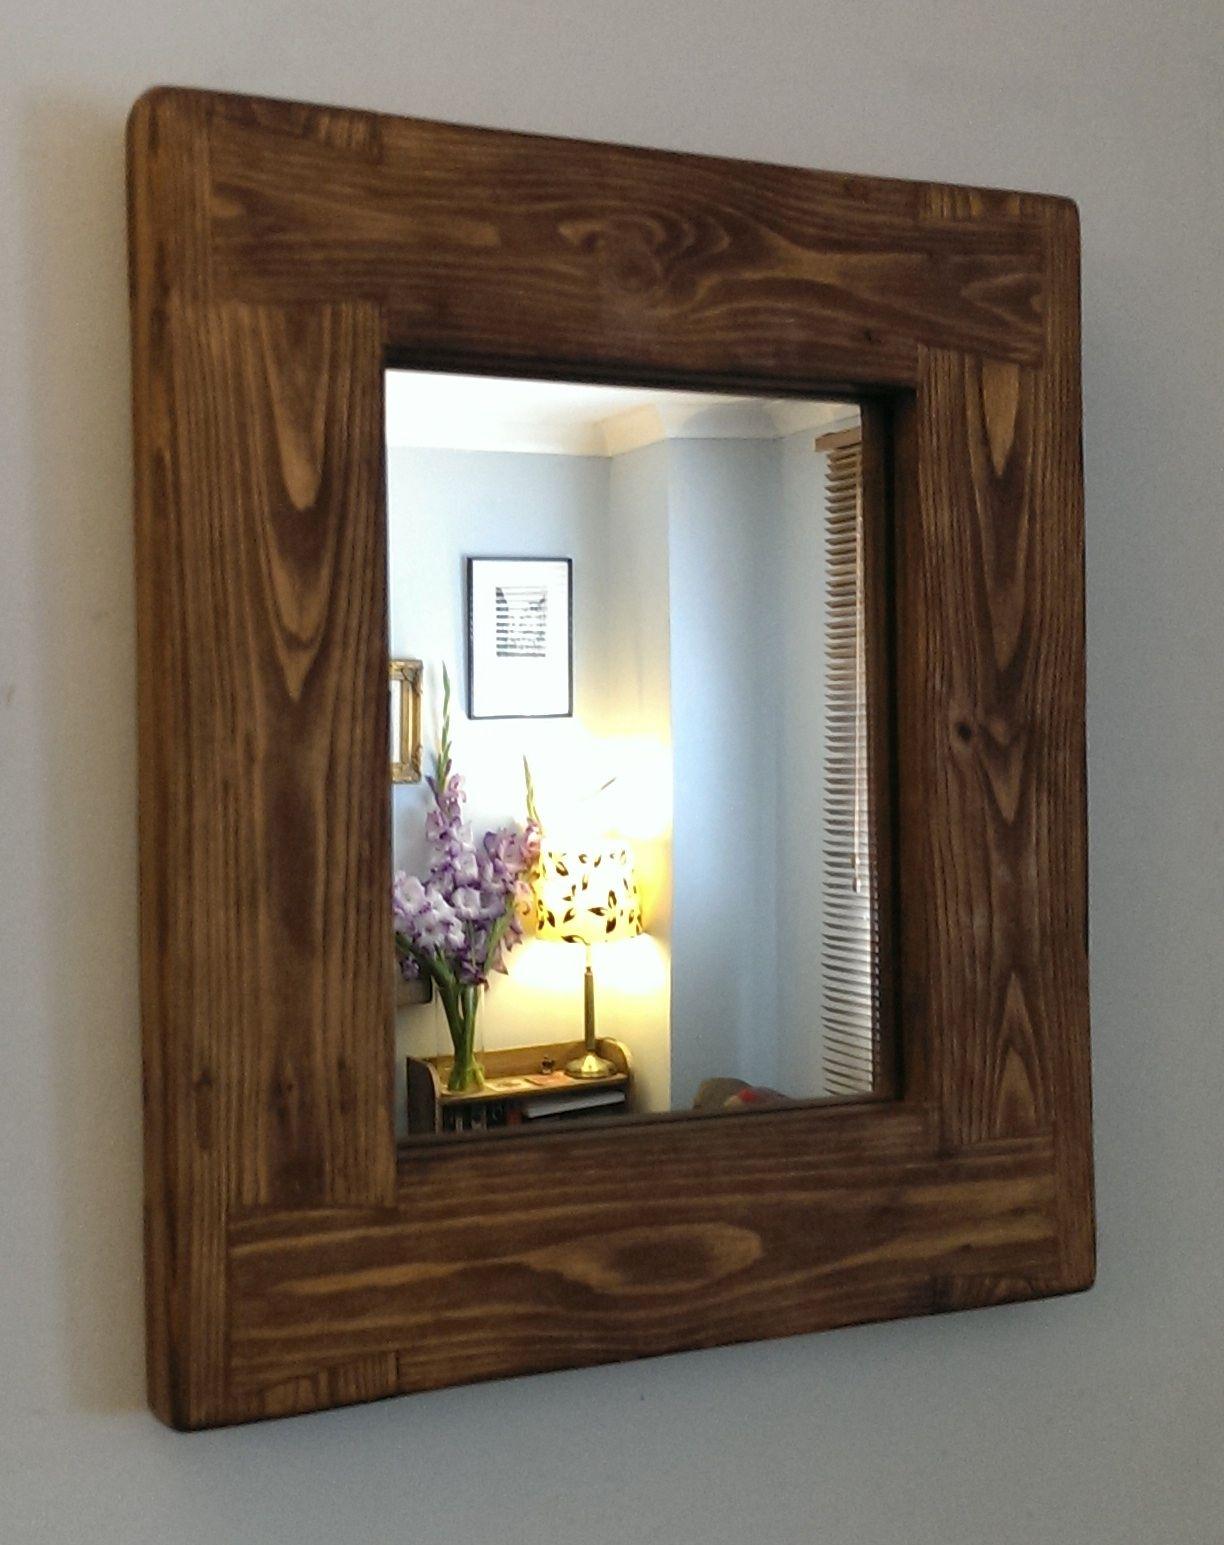 Wooden Wall Mirror Chunky Natural Wood Frame Dark Wood Rustic Finish Premium Custom Handmade In Modern Farmhouse Style From Somerset Uk Mirror Wall Living Room Living Room Mirrors Mirror Wall